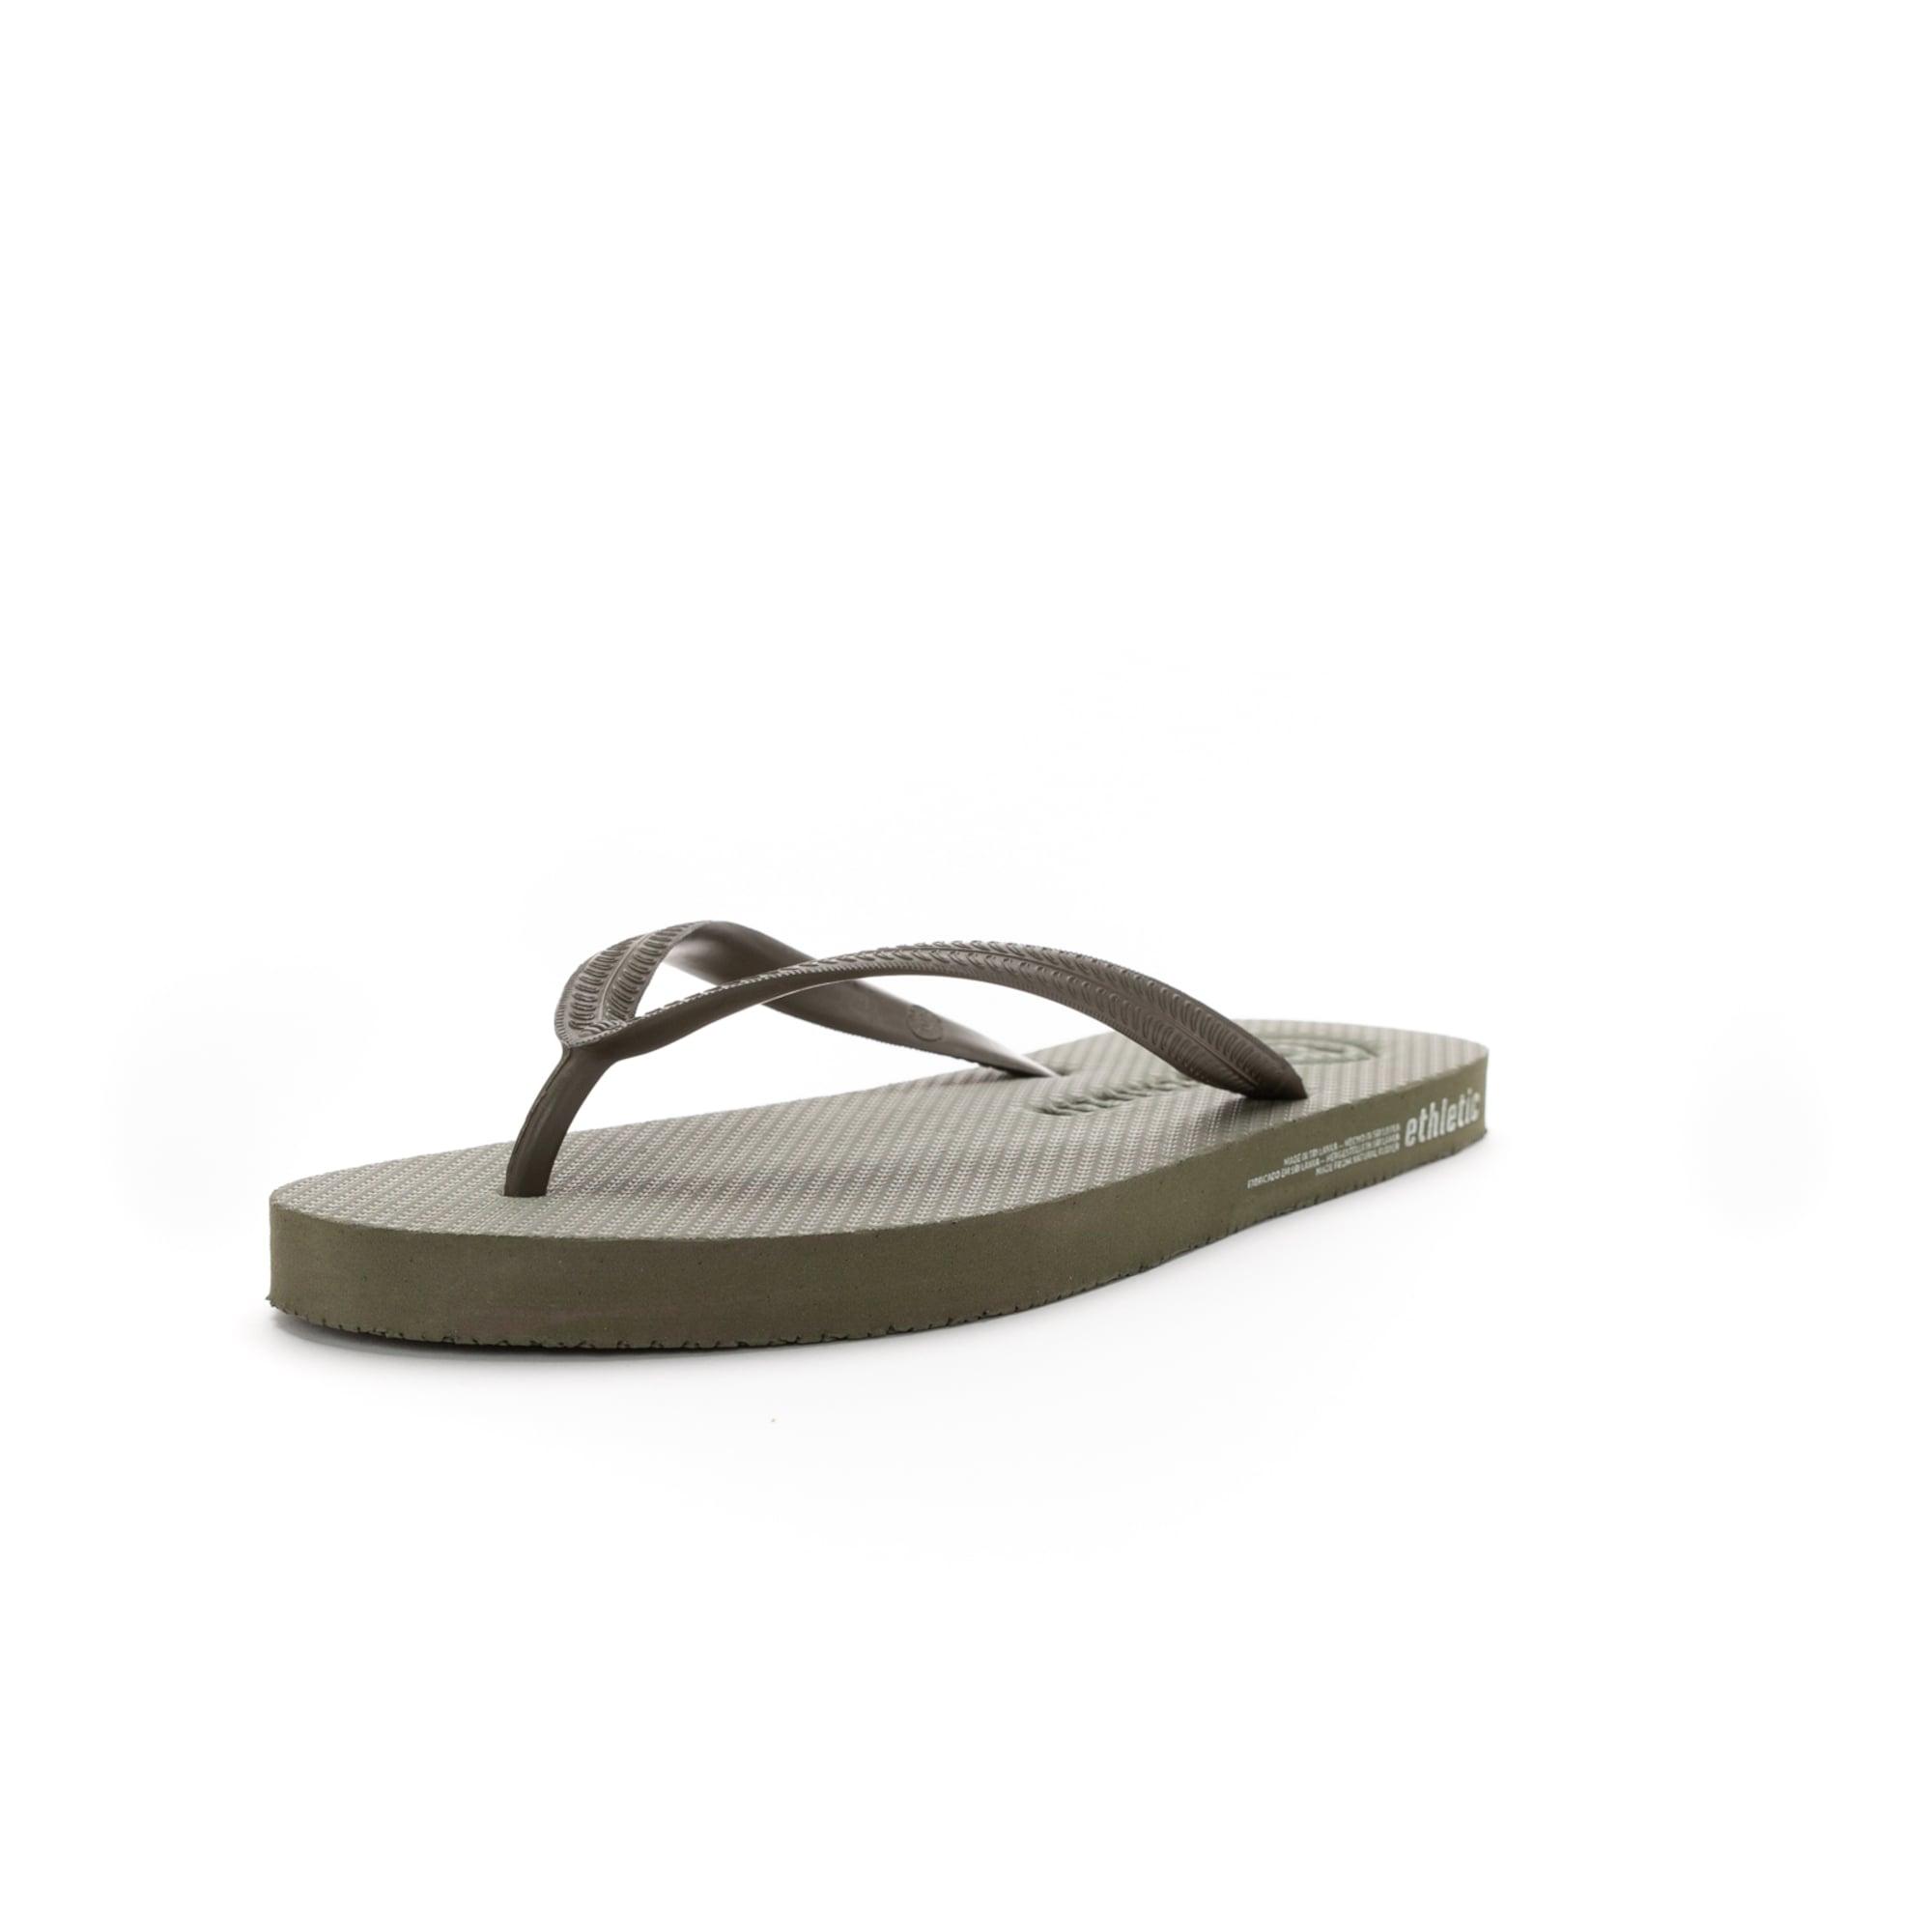 Zehentrenner   Schuhe > Sandalen & Zehentrenner > Zehentrenner   Ethletic